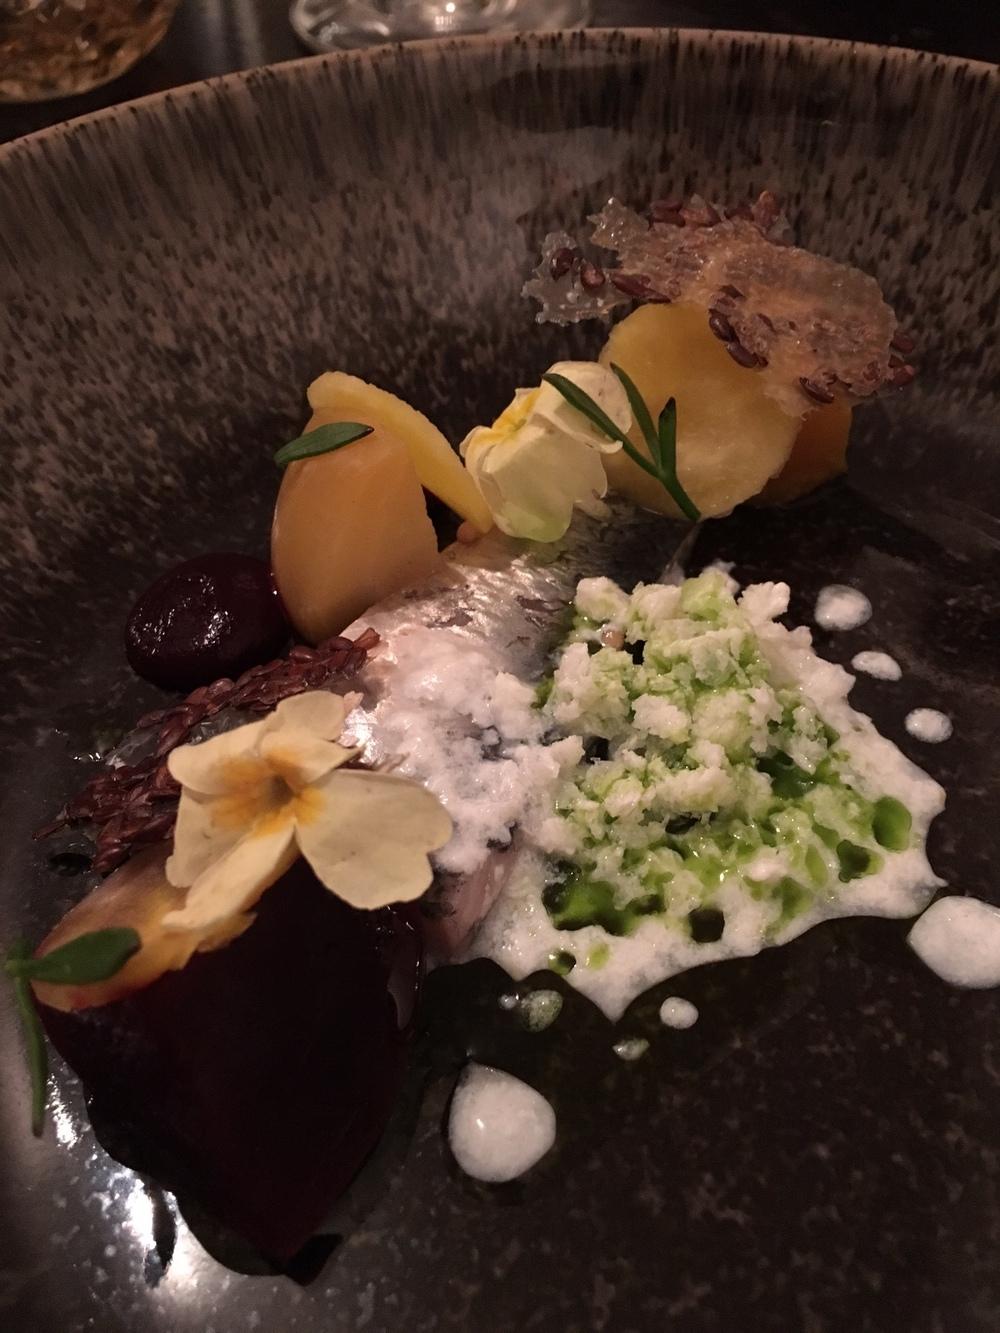 Pickled Herring, Hay-Smoked Beets, Horseradish and Dill at Bulrush